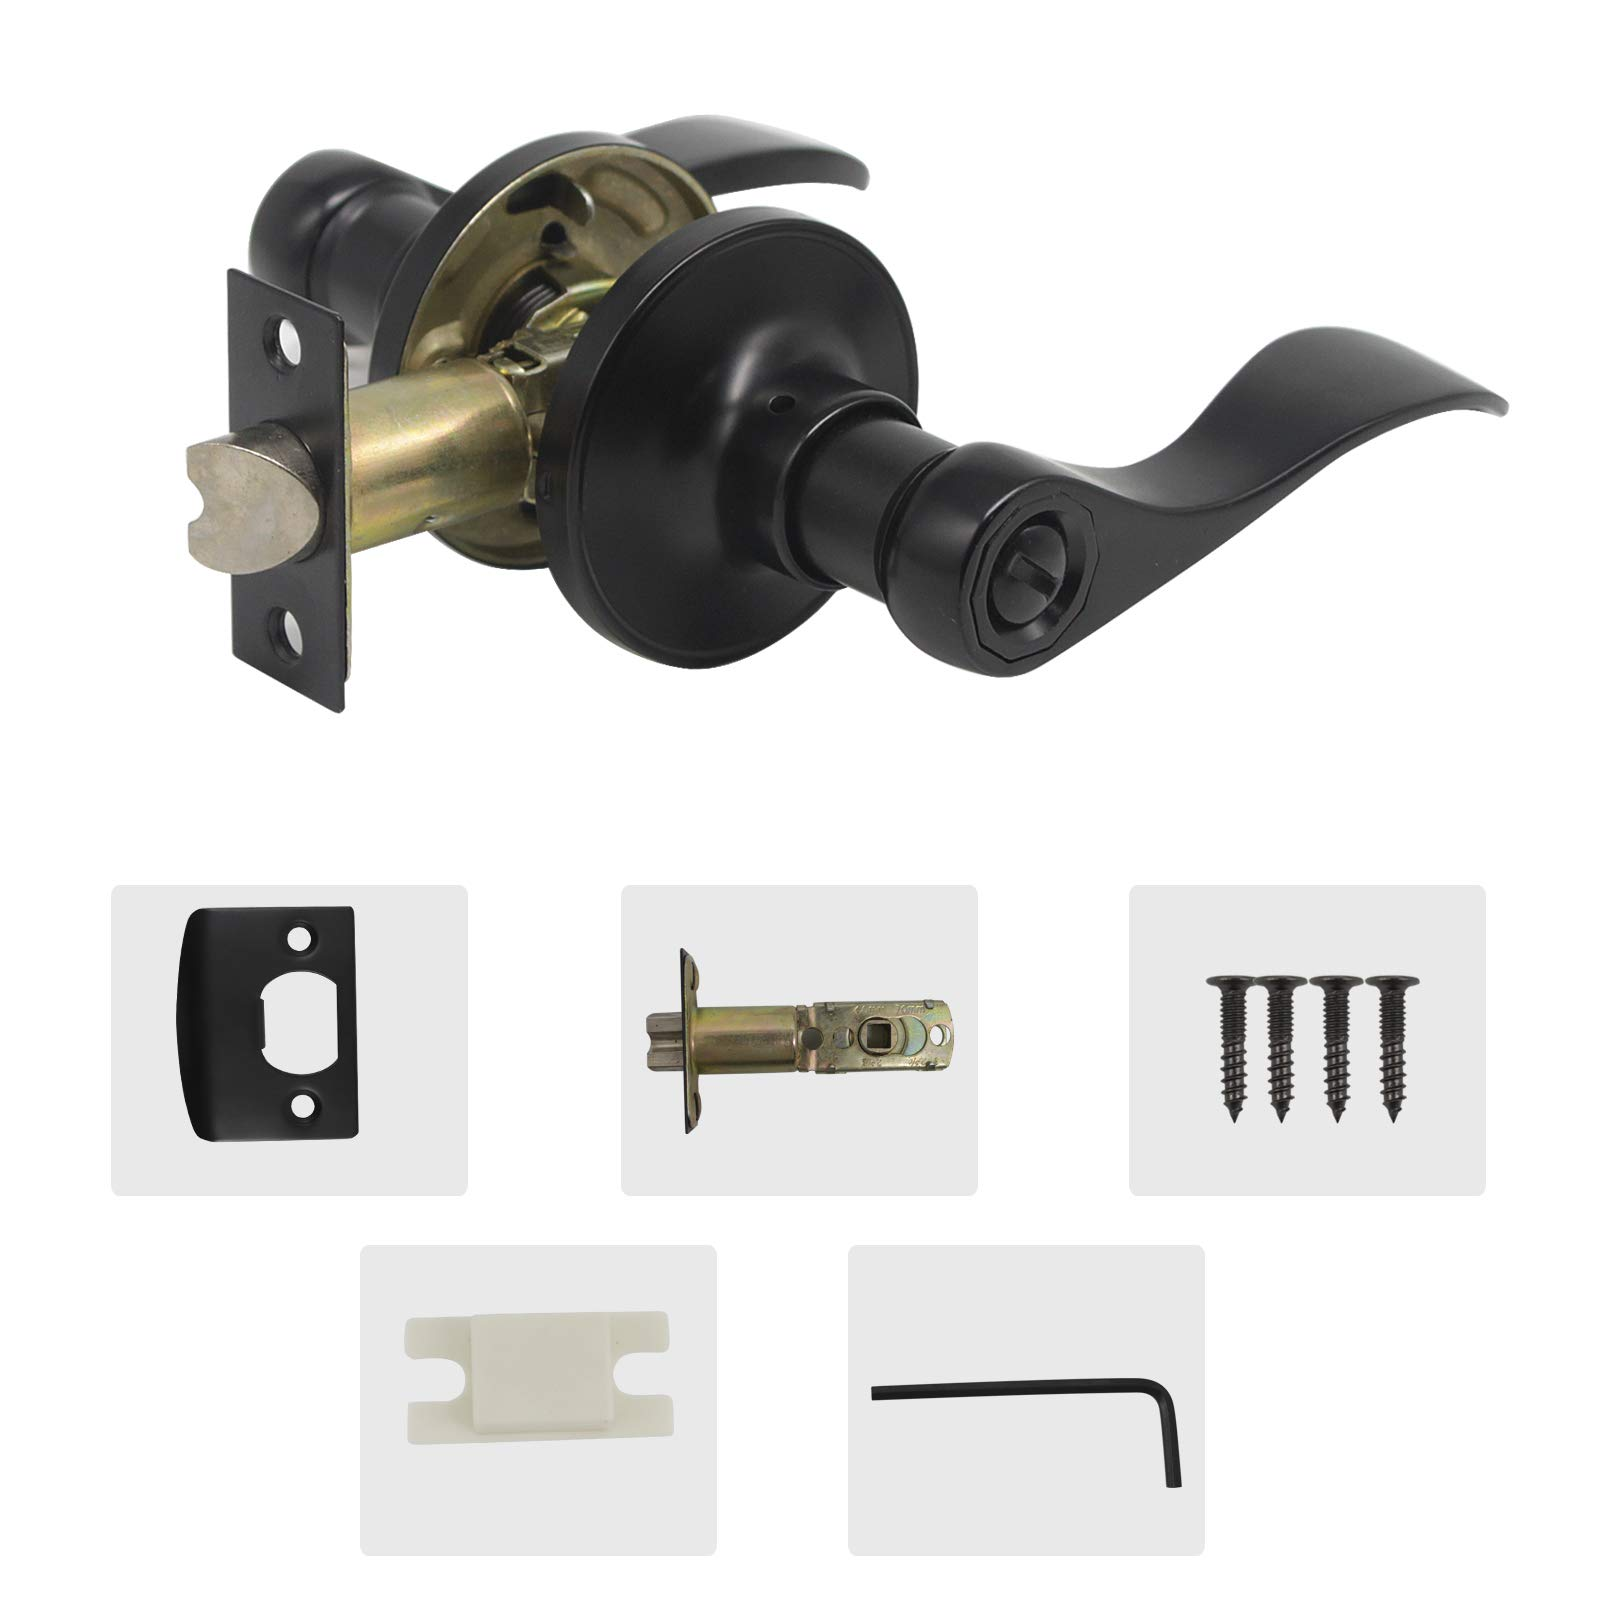 10 Pack Probrico Door Lever Privacy Door Lock Doorknobs Handle Hardware Keyless Lockset for Storage Room Bedroom Bathroom Without Key in Black-Right/Left Handed Reversible by Probrico (Image #4)